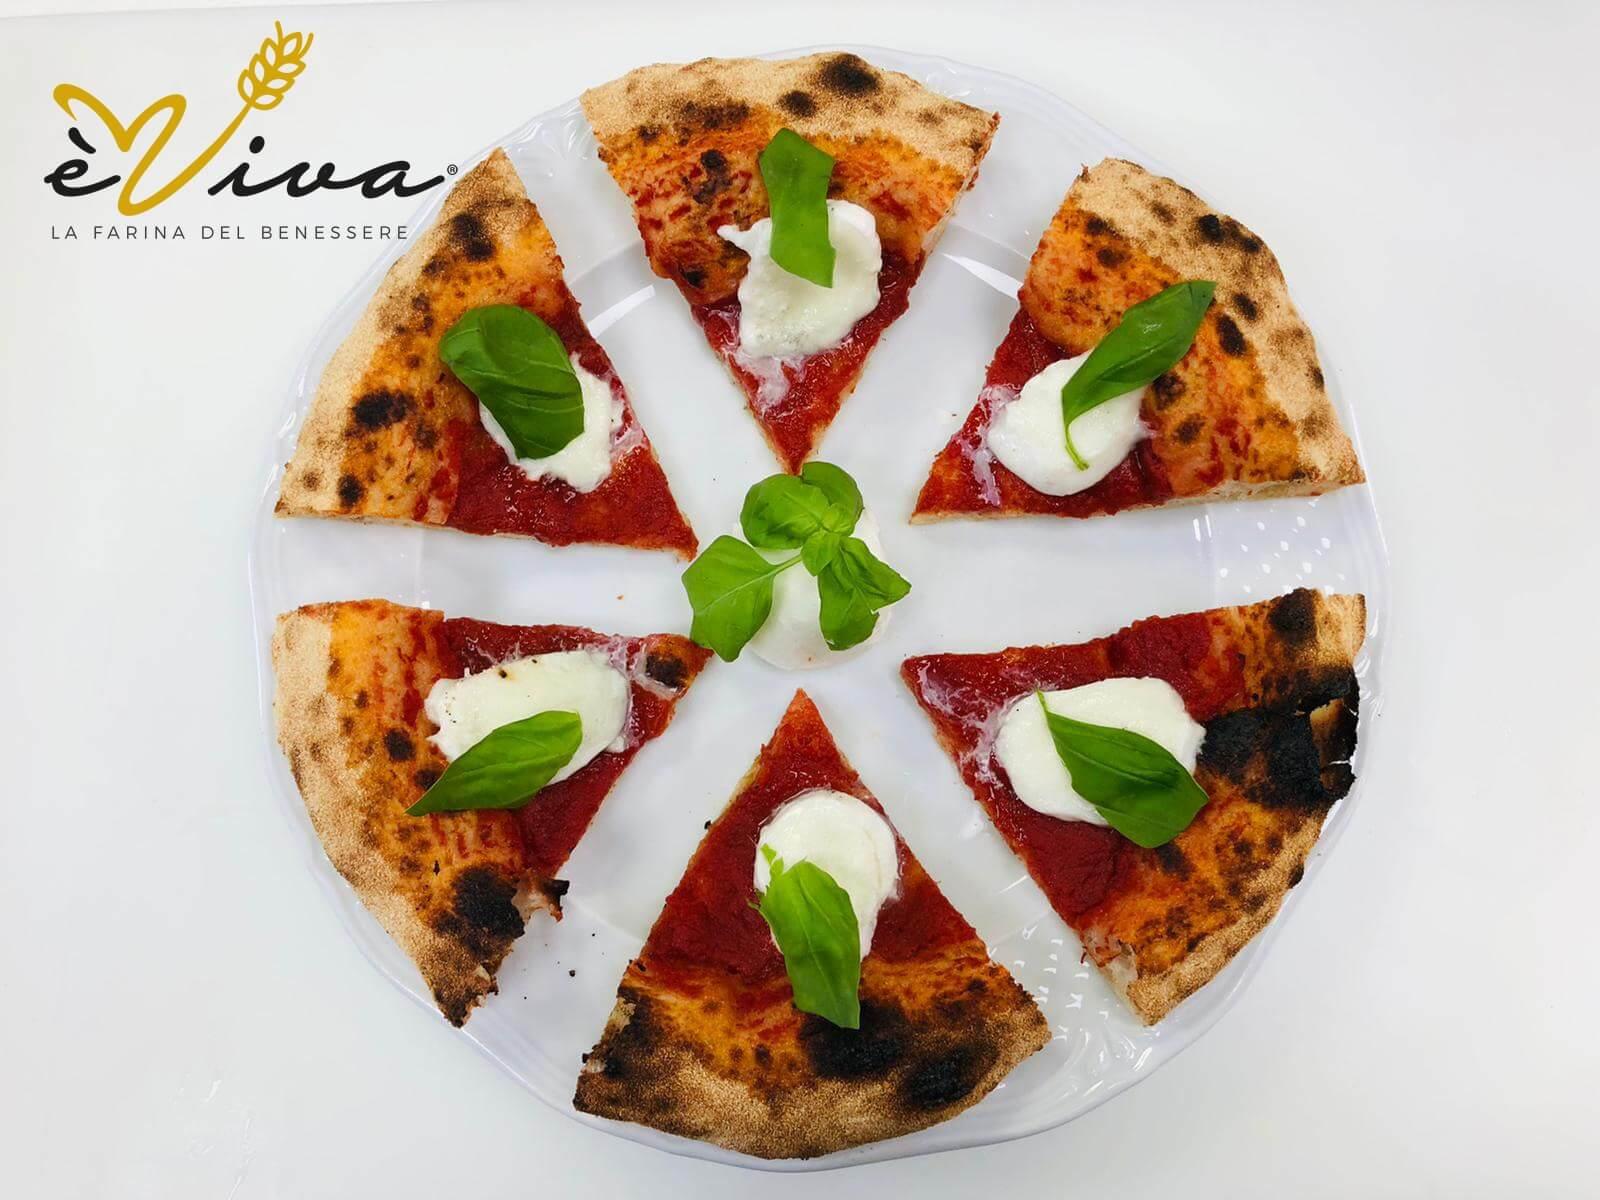 Ricetta Pizza Napoletana Viva La Focaccia.Ricetta Pizza Napoletana Ricetta Con Eviva La Farina